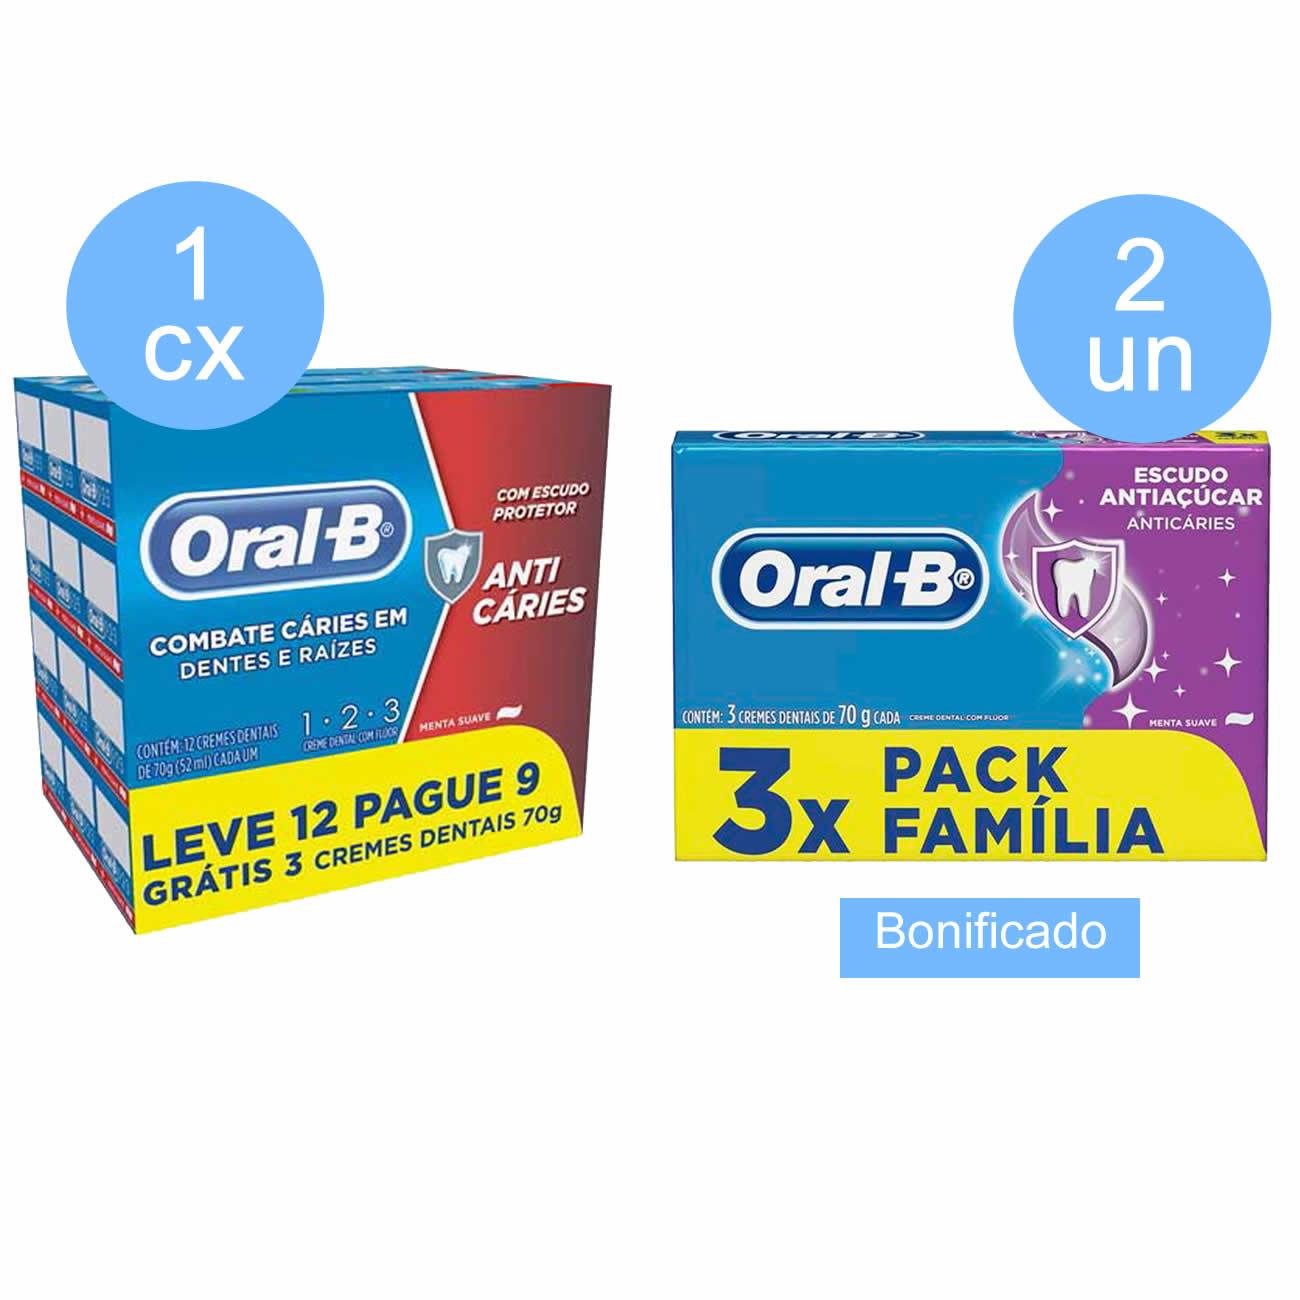 Compre 1 caixa (com 9 unidades) Creme Dental Oral-B 123 70 Gramas Pack Leve 12 Pague 9  Ganhe 2 un Creme Dental Oral-B 70G 3Un Anti Acucar